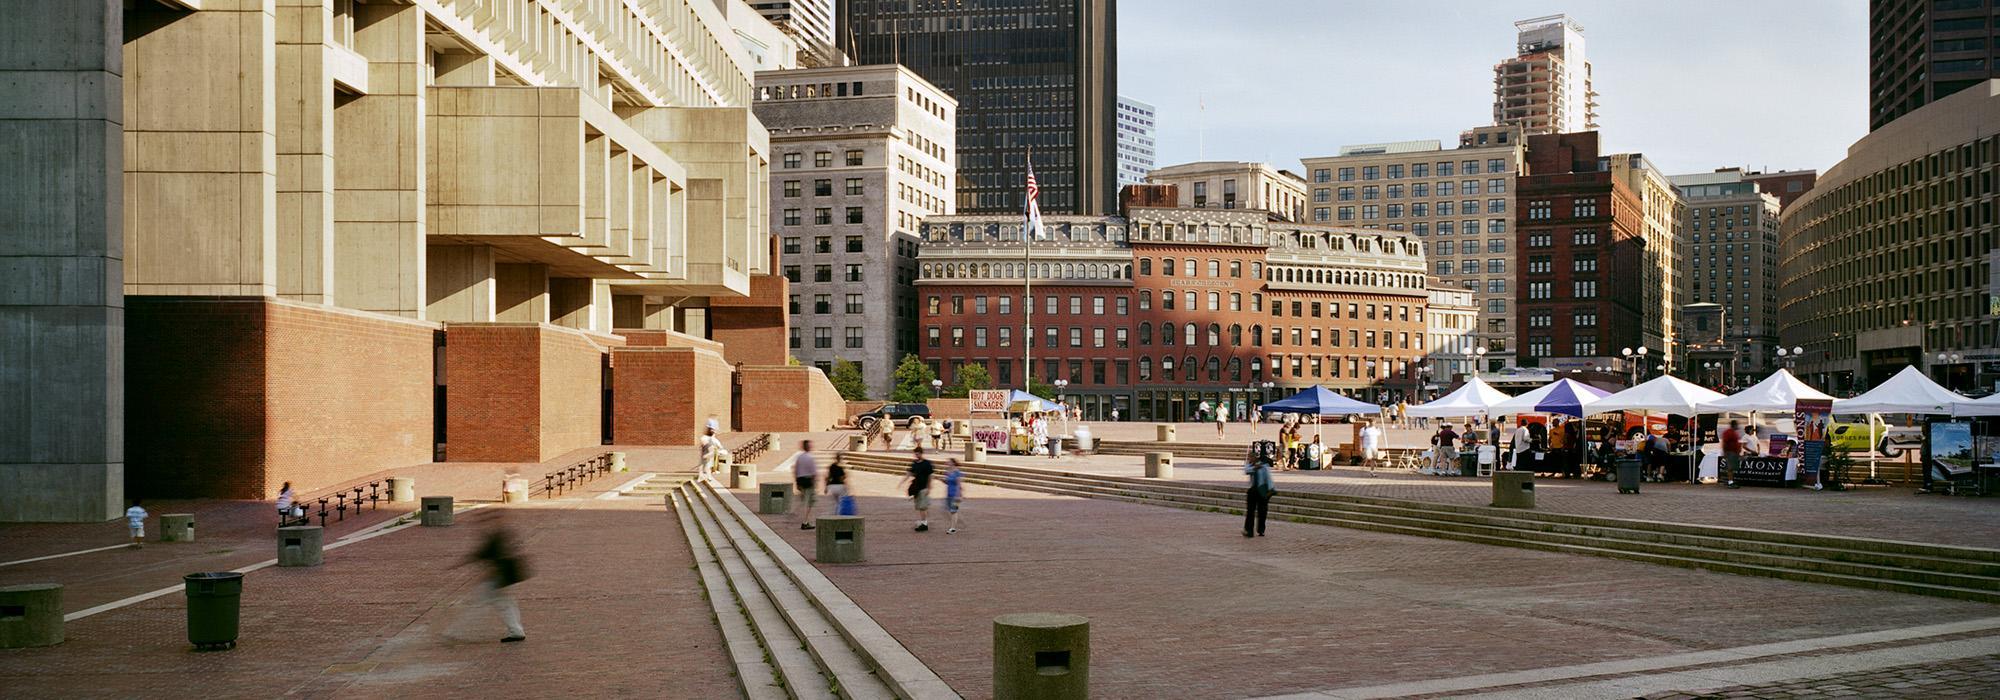 BostonCityHallPlaza_hero_©SamSweezy_2008.jpg